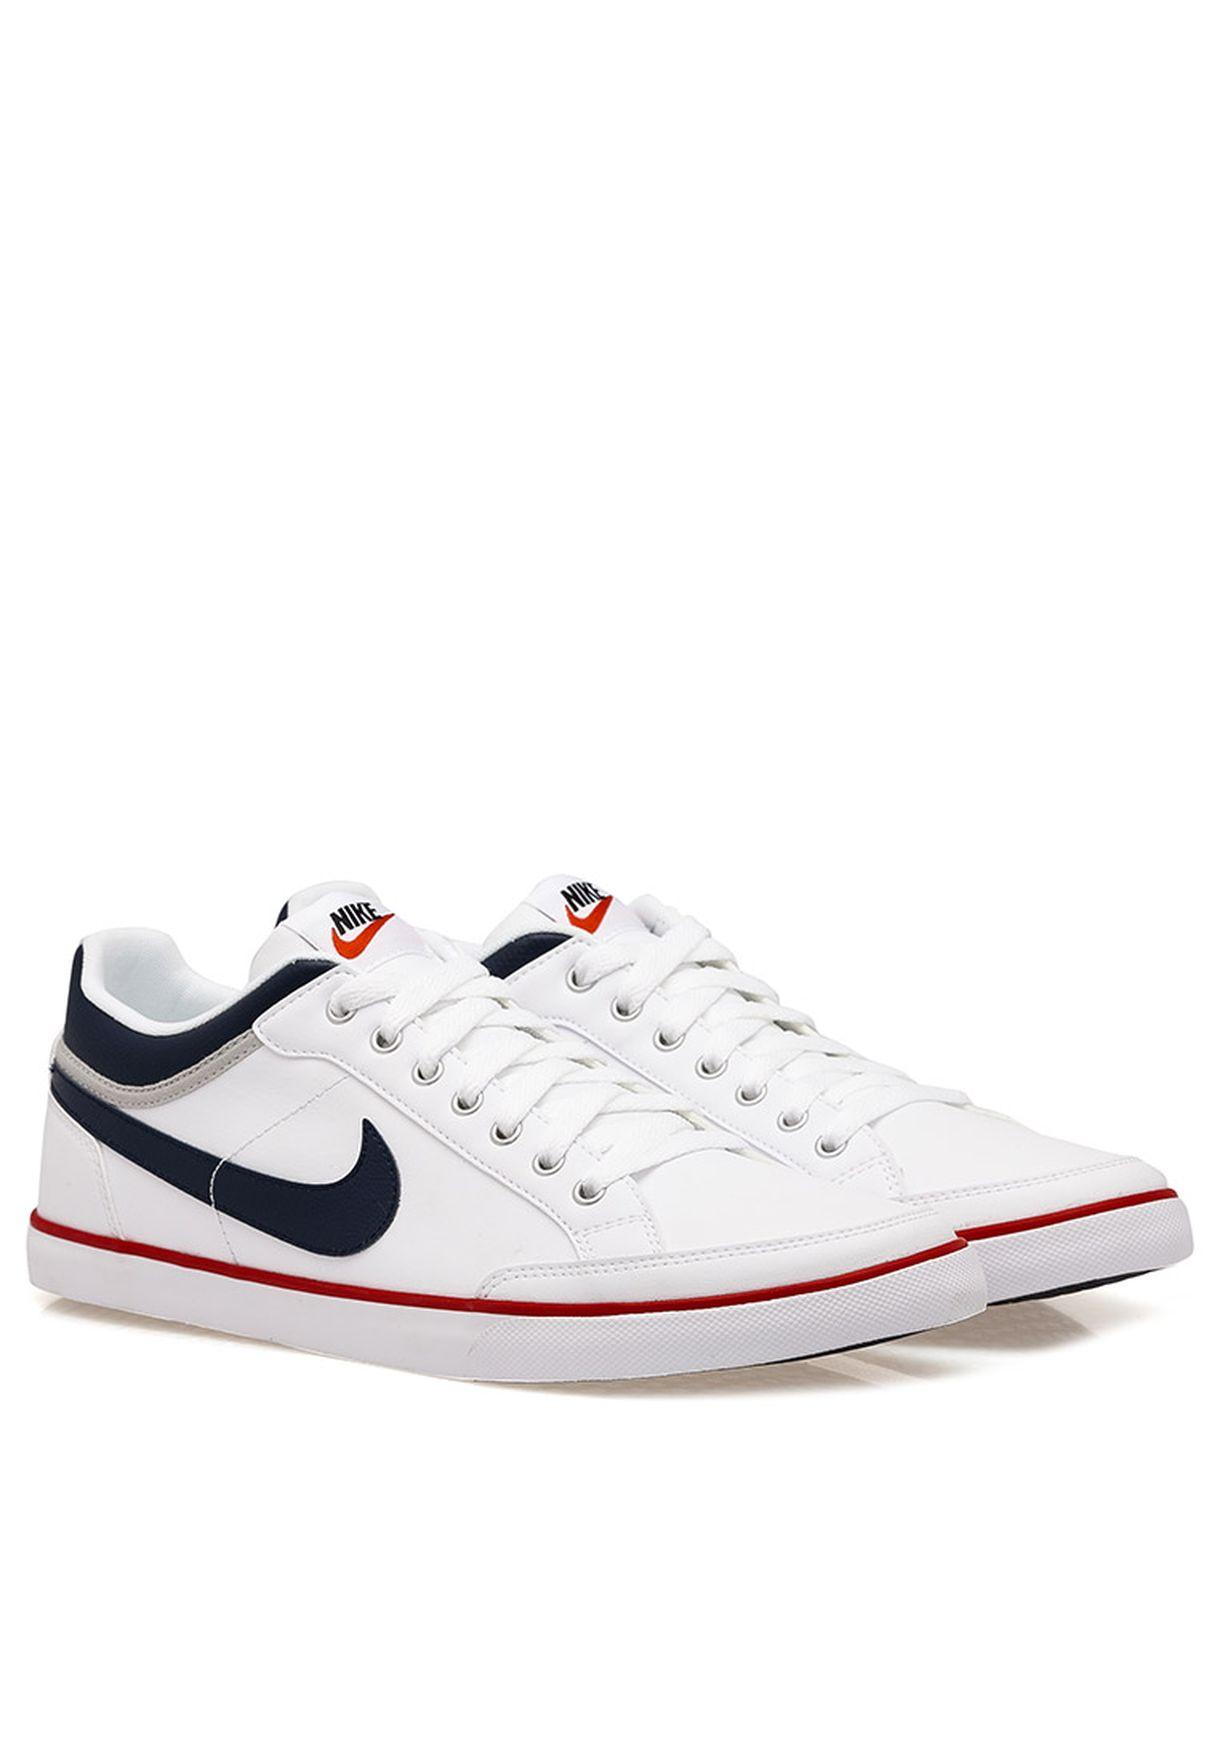 timeless design e11c6 0215c Nike Capri III Sneaker